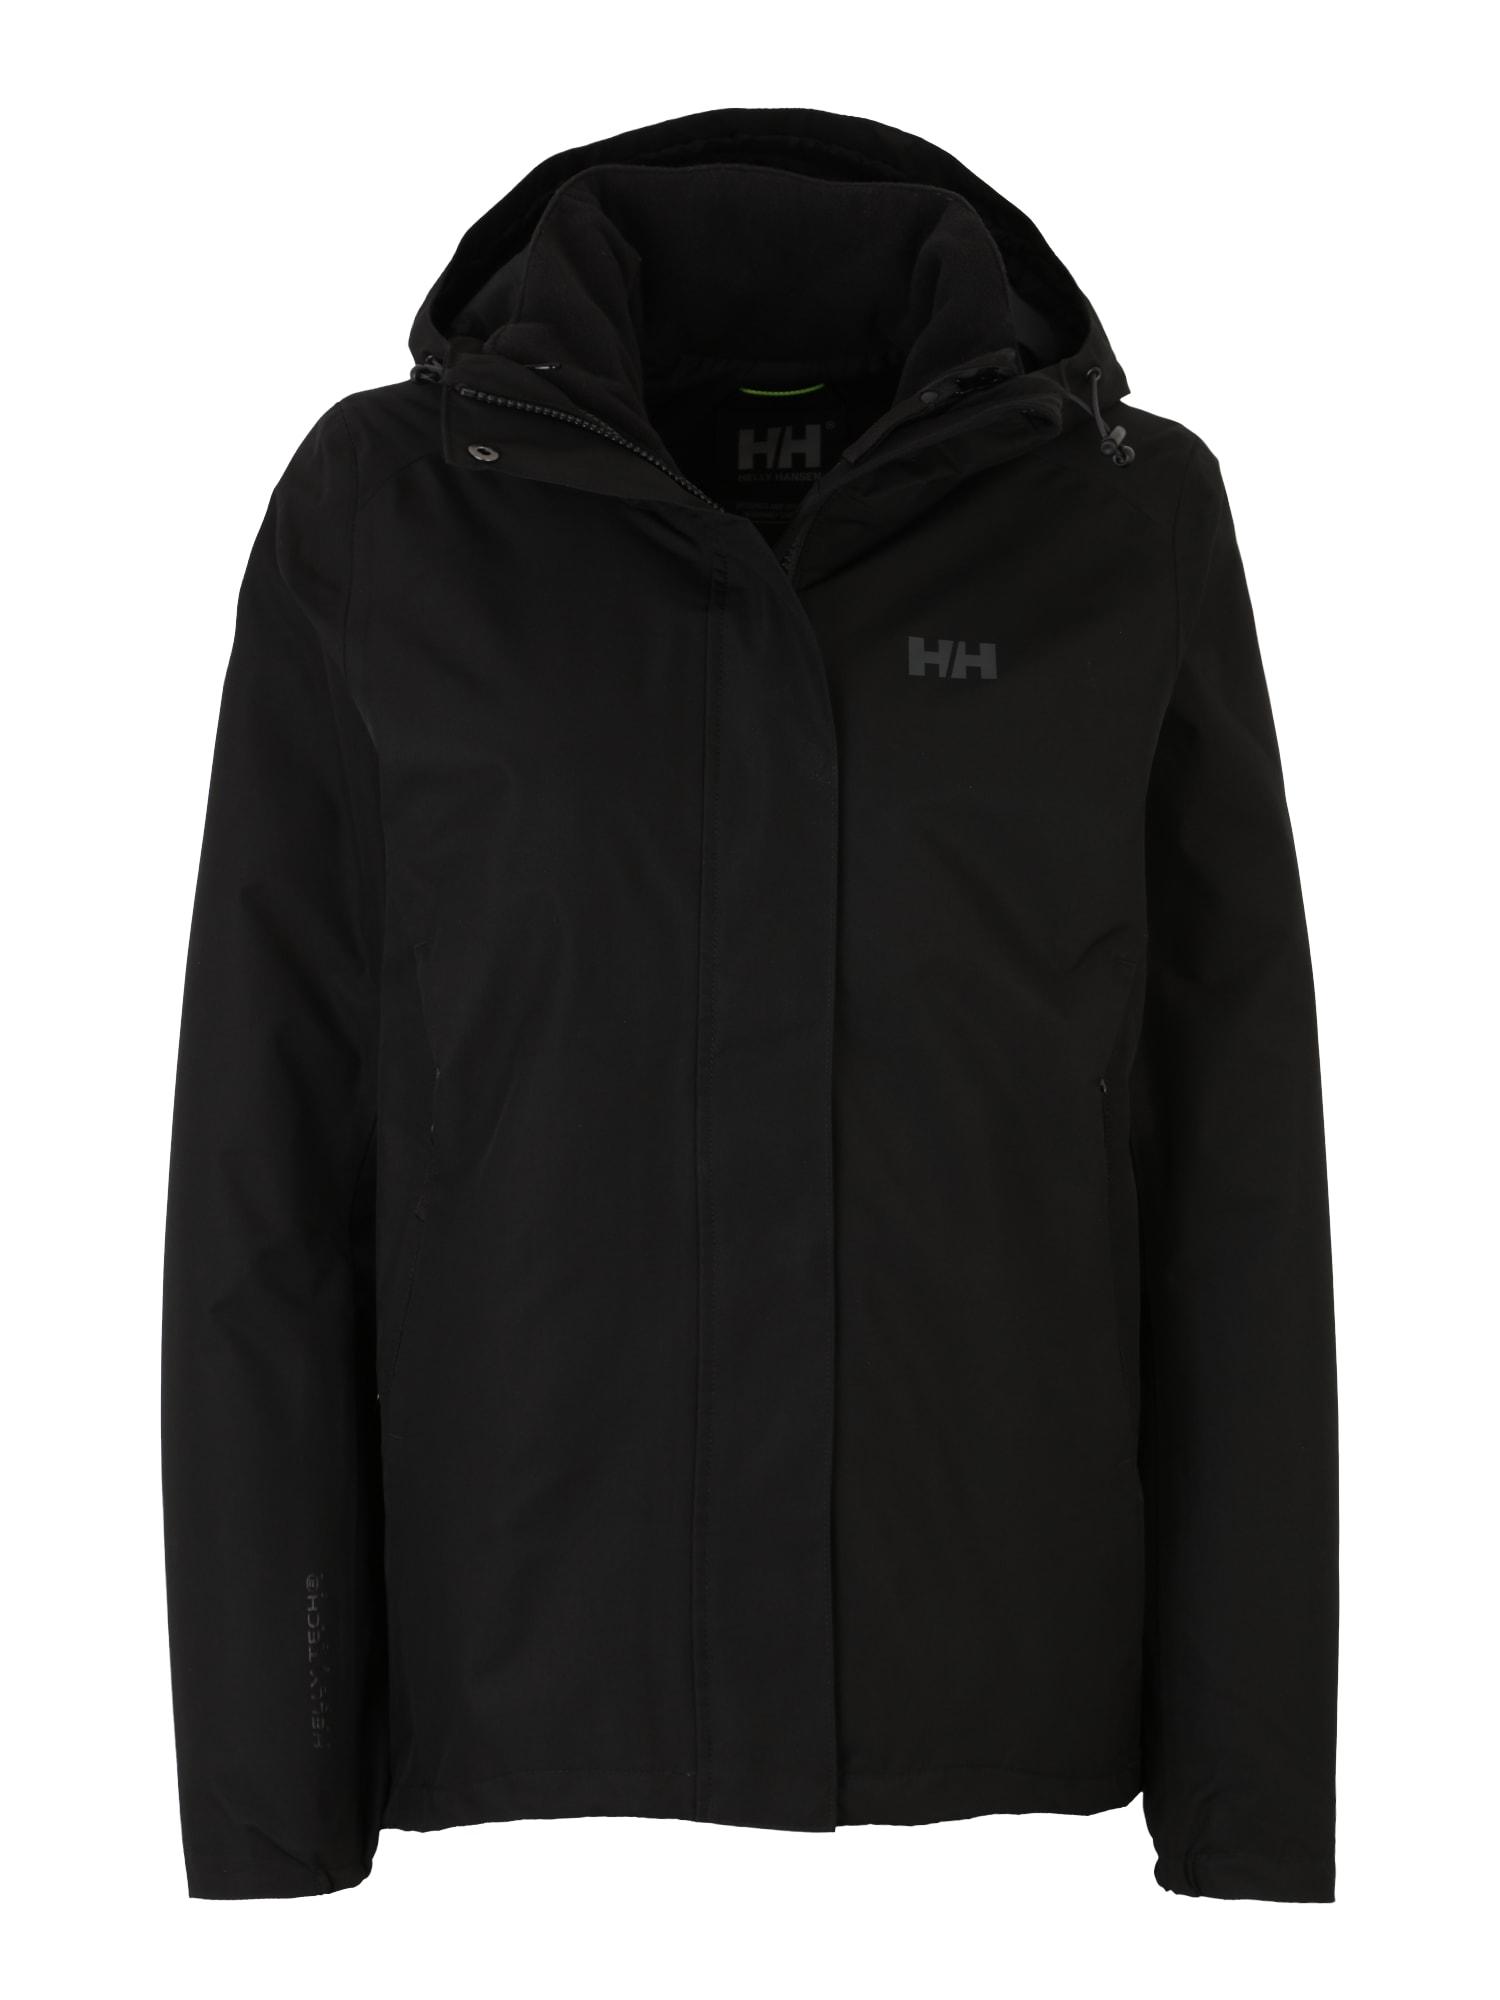 Outdoorová bunda SQUAMISH 2.0 CIS černá HELLY HANSEN